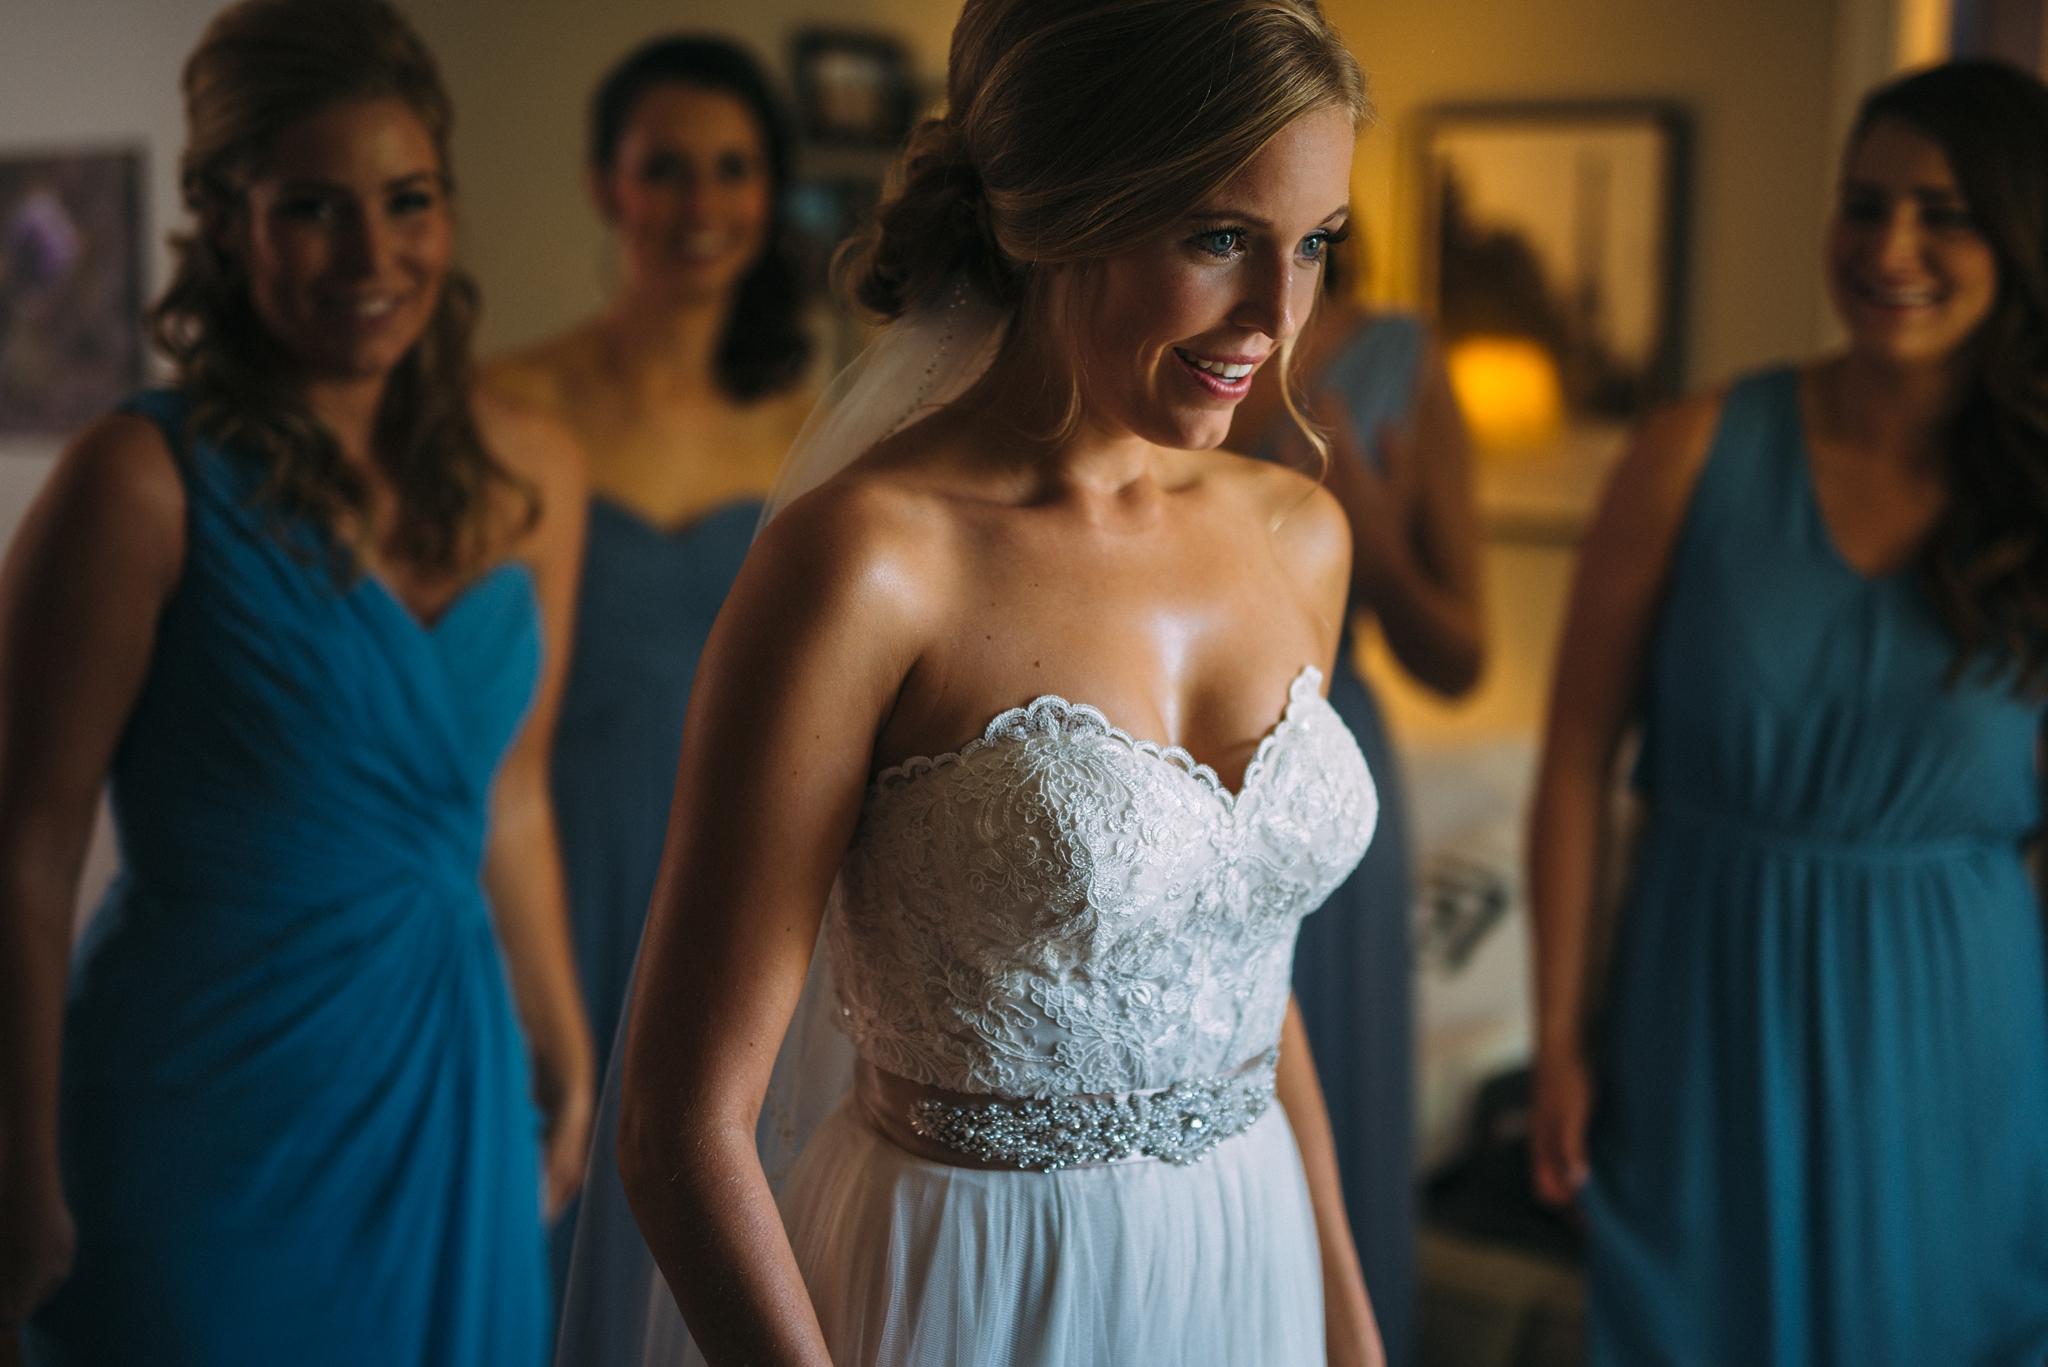 kaihla_tonai_intimate_wedding_elopement_photographer_2873